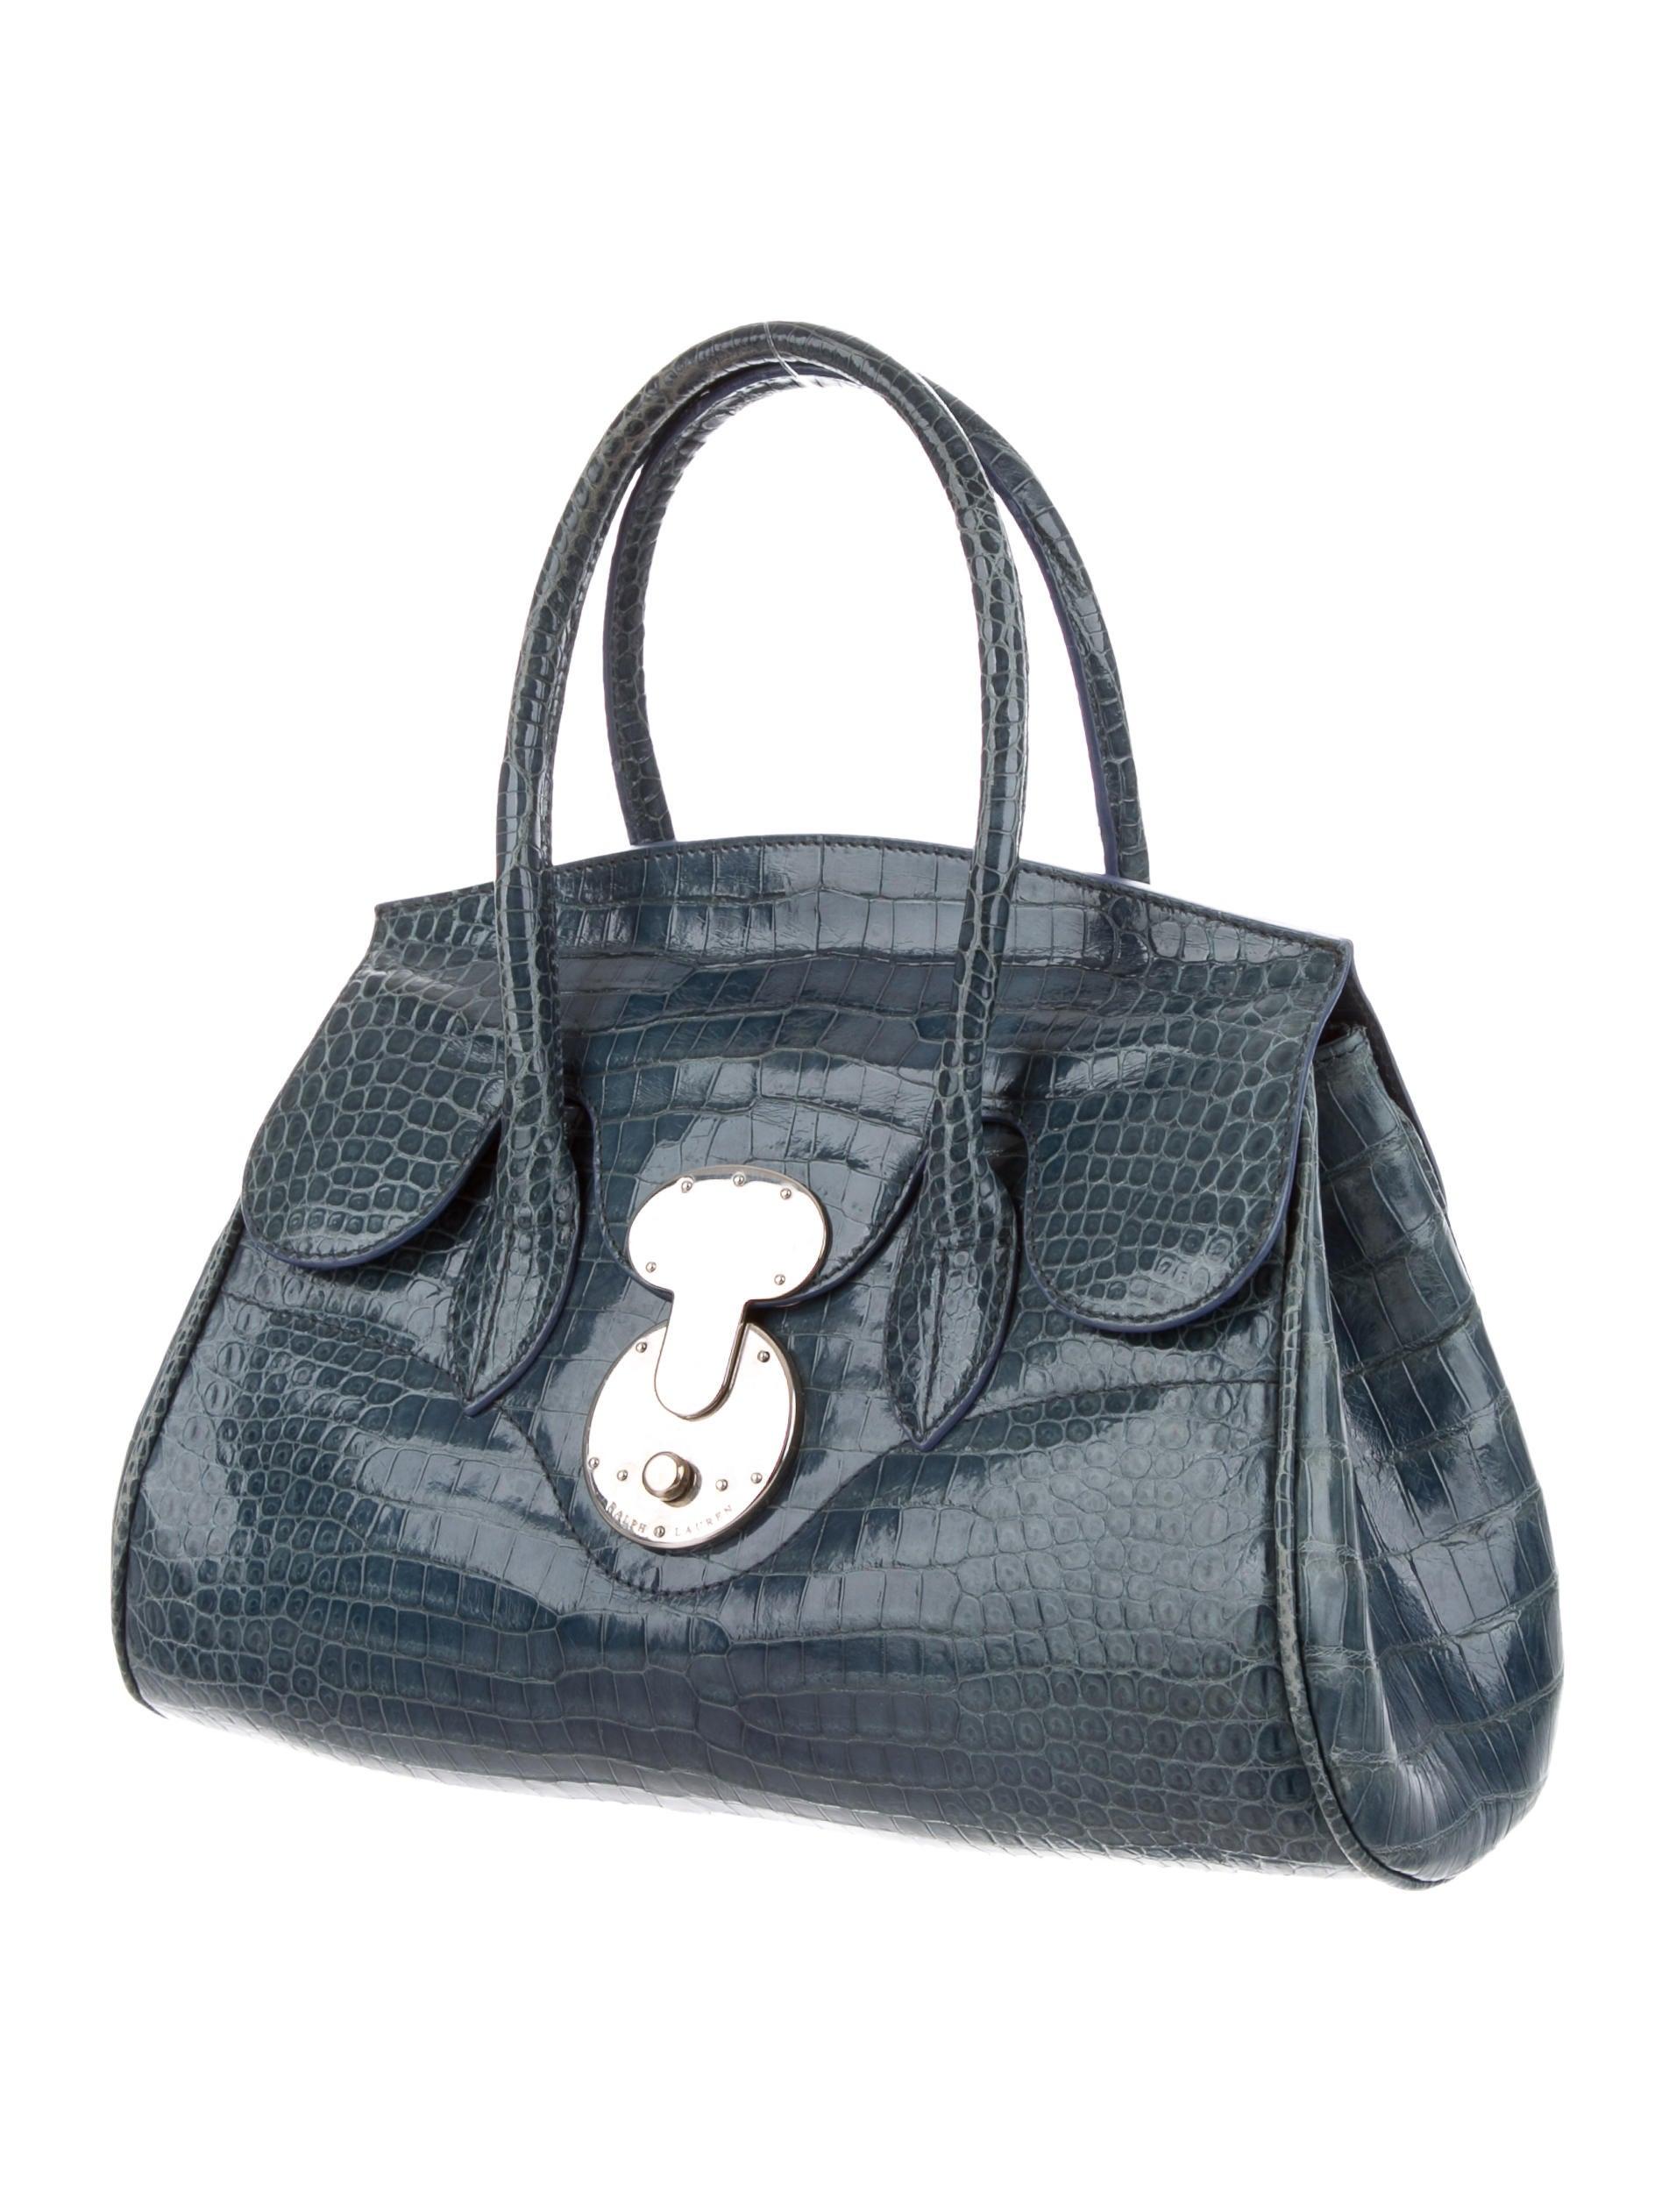 de68de903775 ... where can i buy ralph lauren alligator ricky bag handbags wyg28304 the  realreal 0ba41 6d5d0 ...